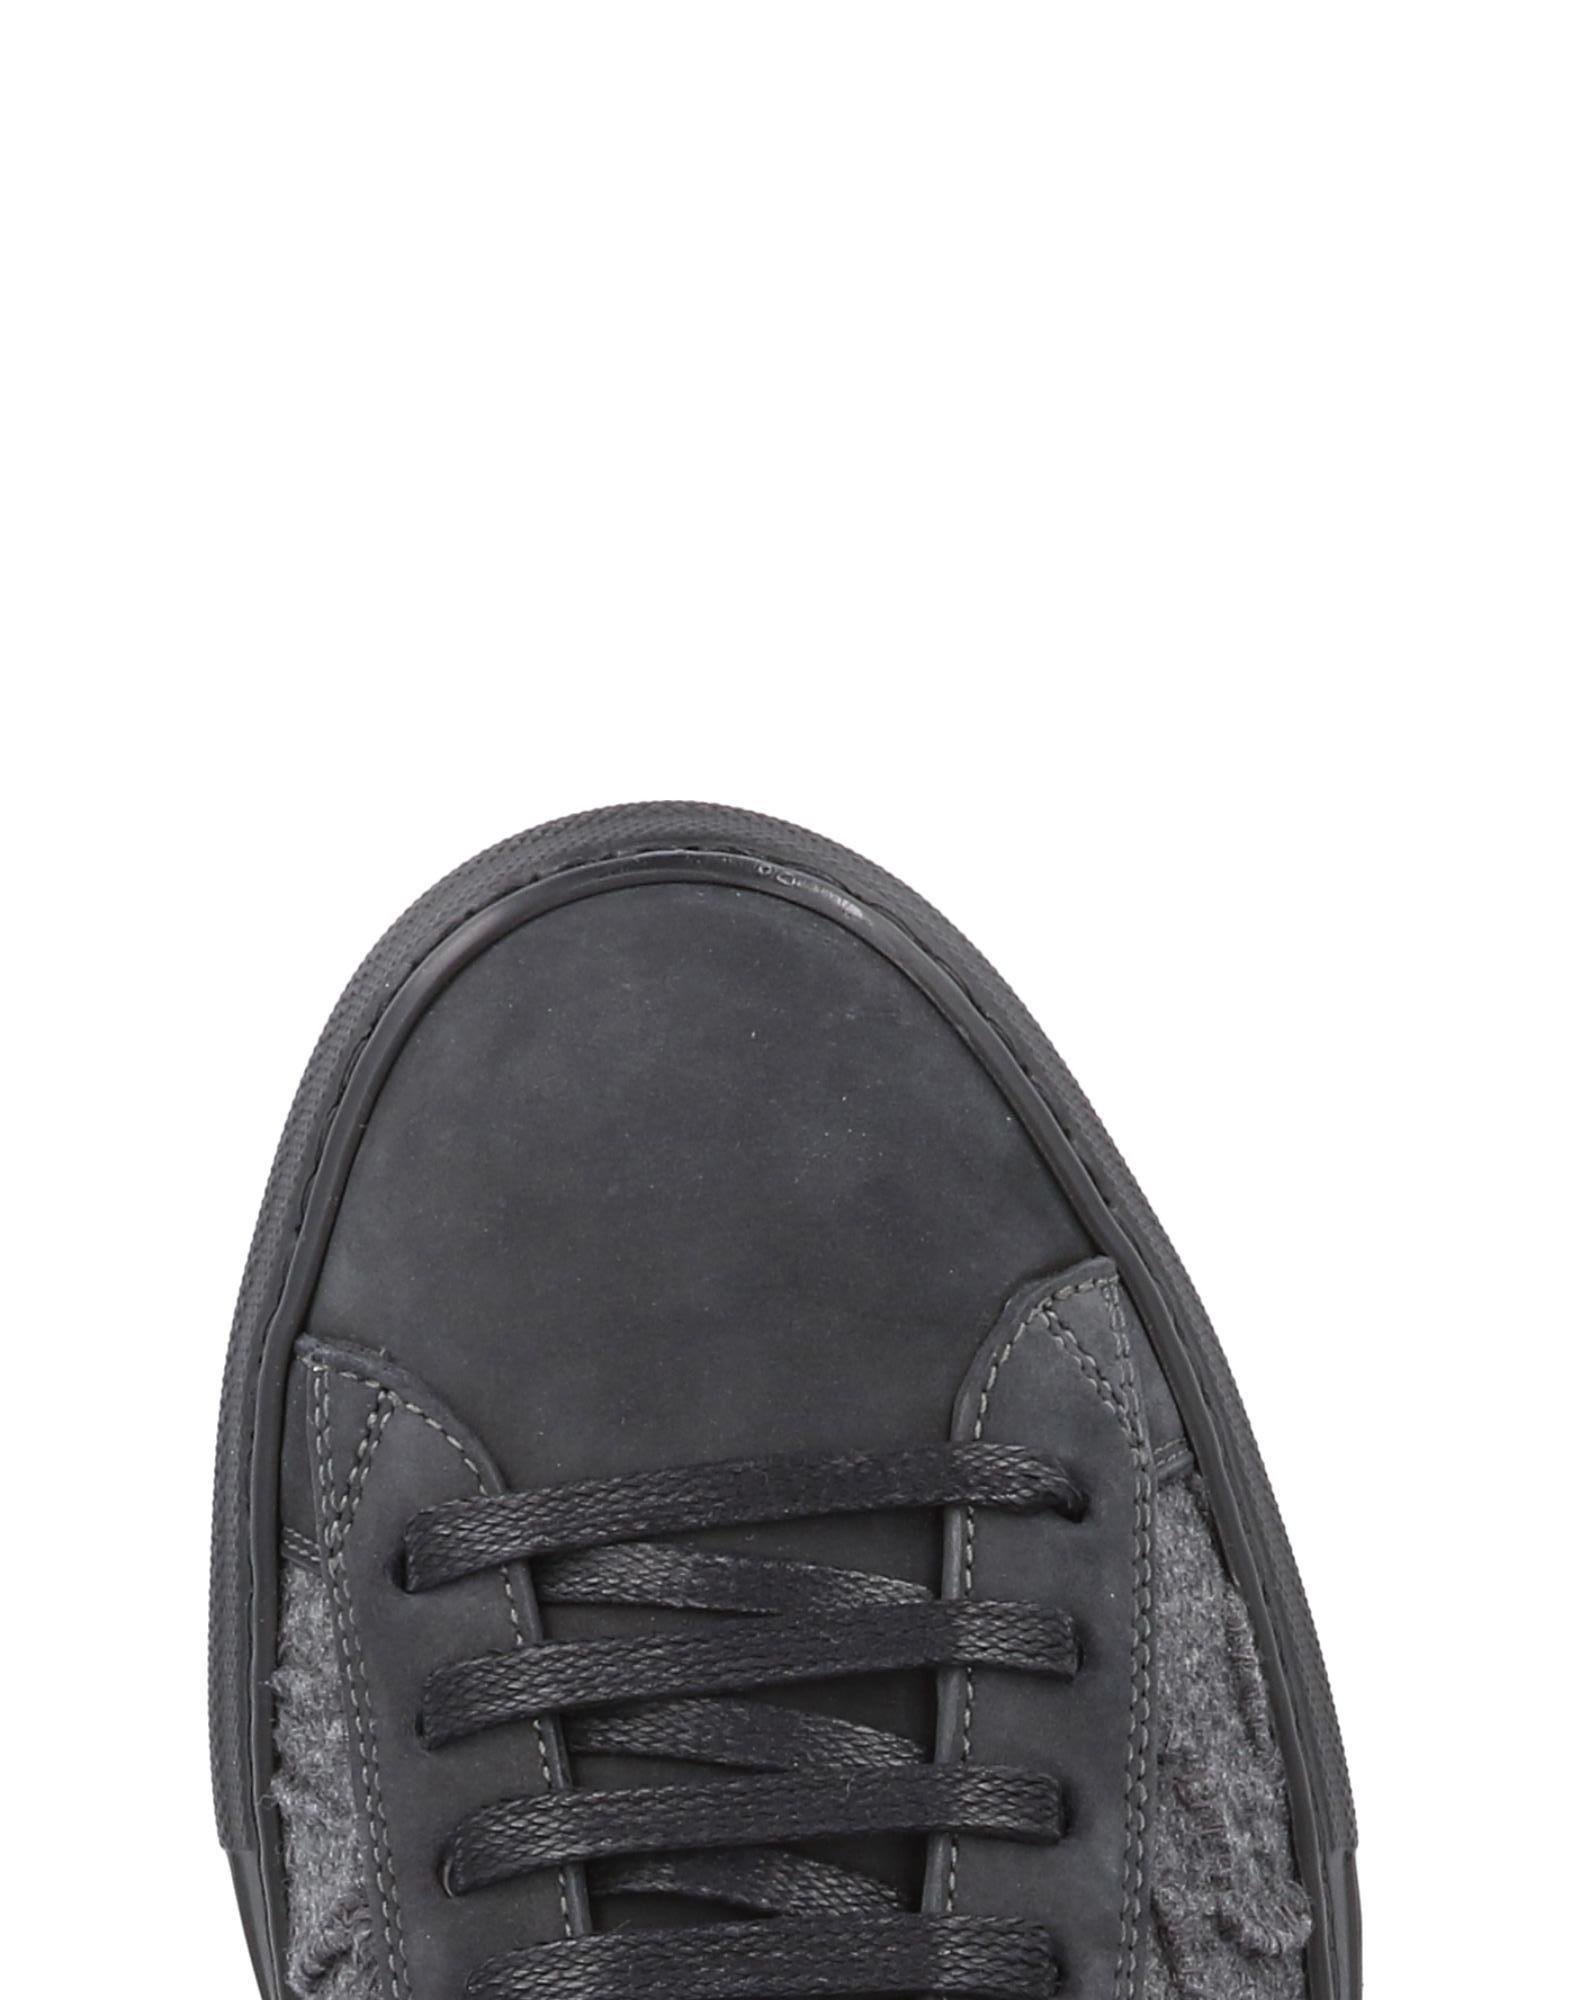 Rabatt Filippi Schuhe Fabiana Filippi Rabatt Sneakers Damen  11480653SM 993a28